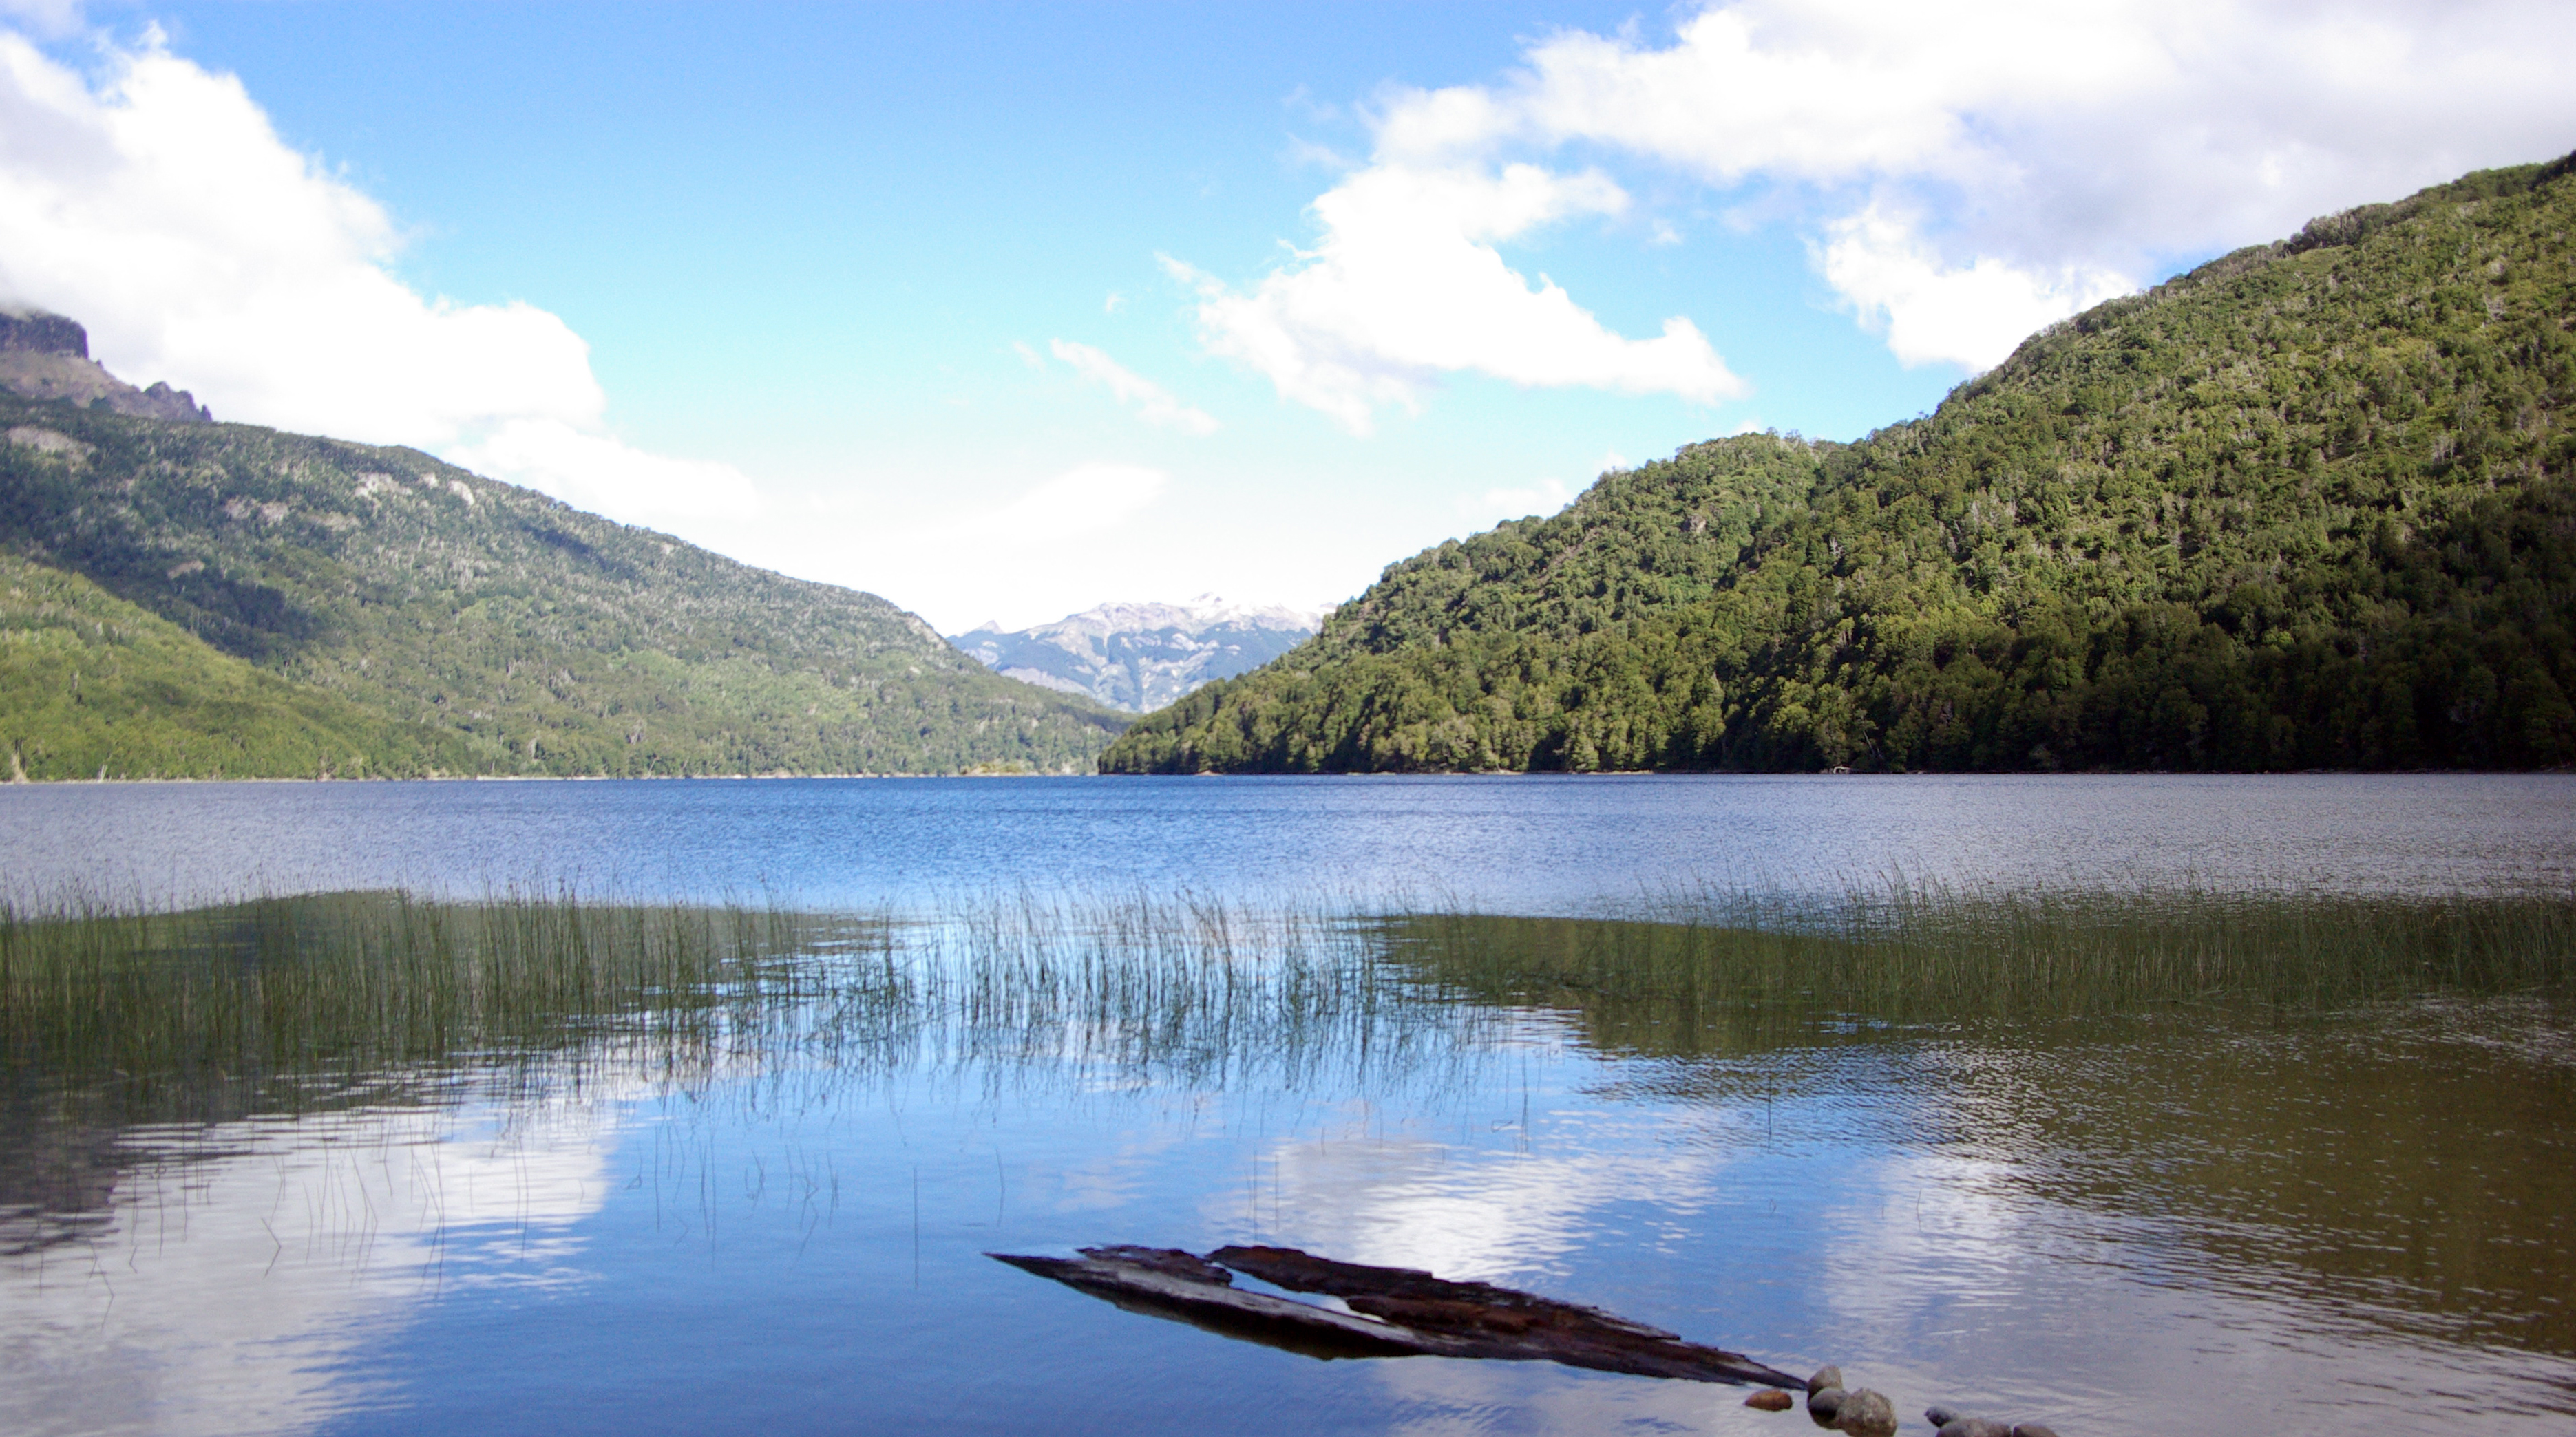 Lago Villarino - Ruta de los Siete Lagos - Argentina - Flickr - Antoine Hubert